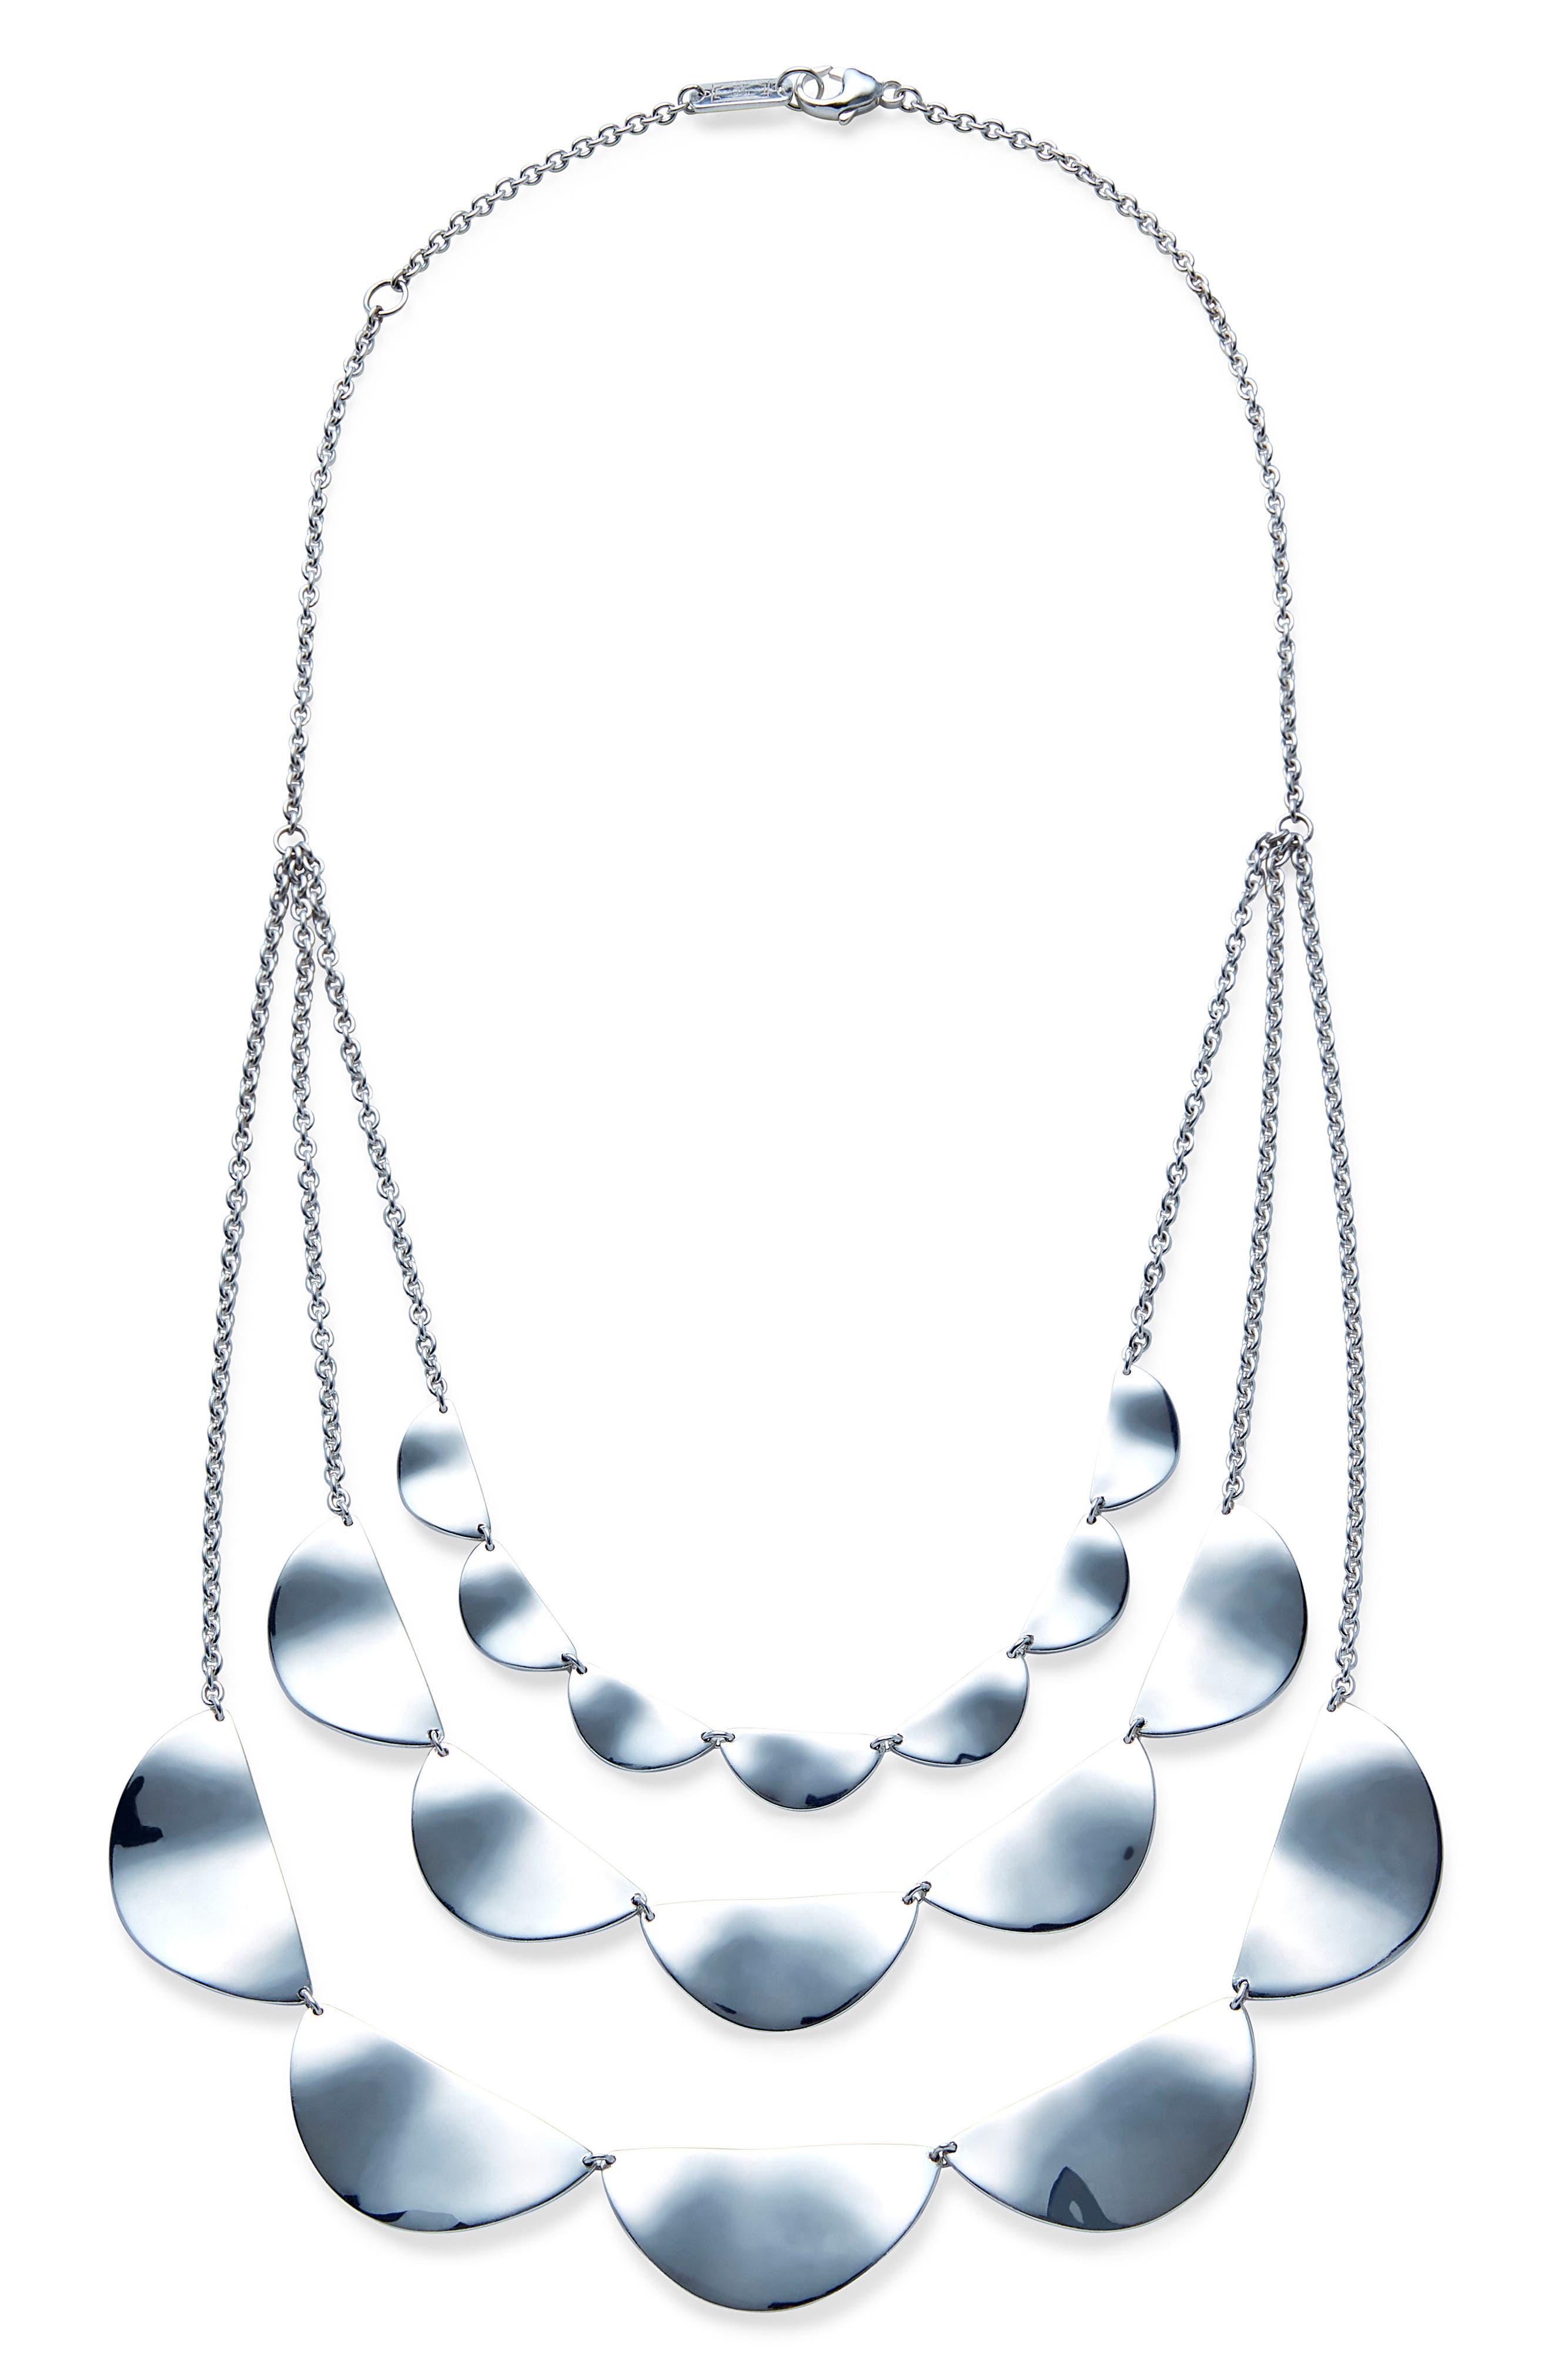 Classico Three-Strand Half Paillette Necklace,                             Main thumbnail 1, color,                             040